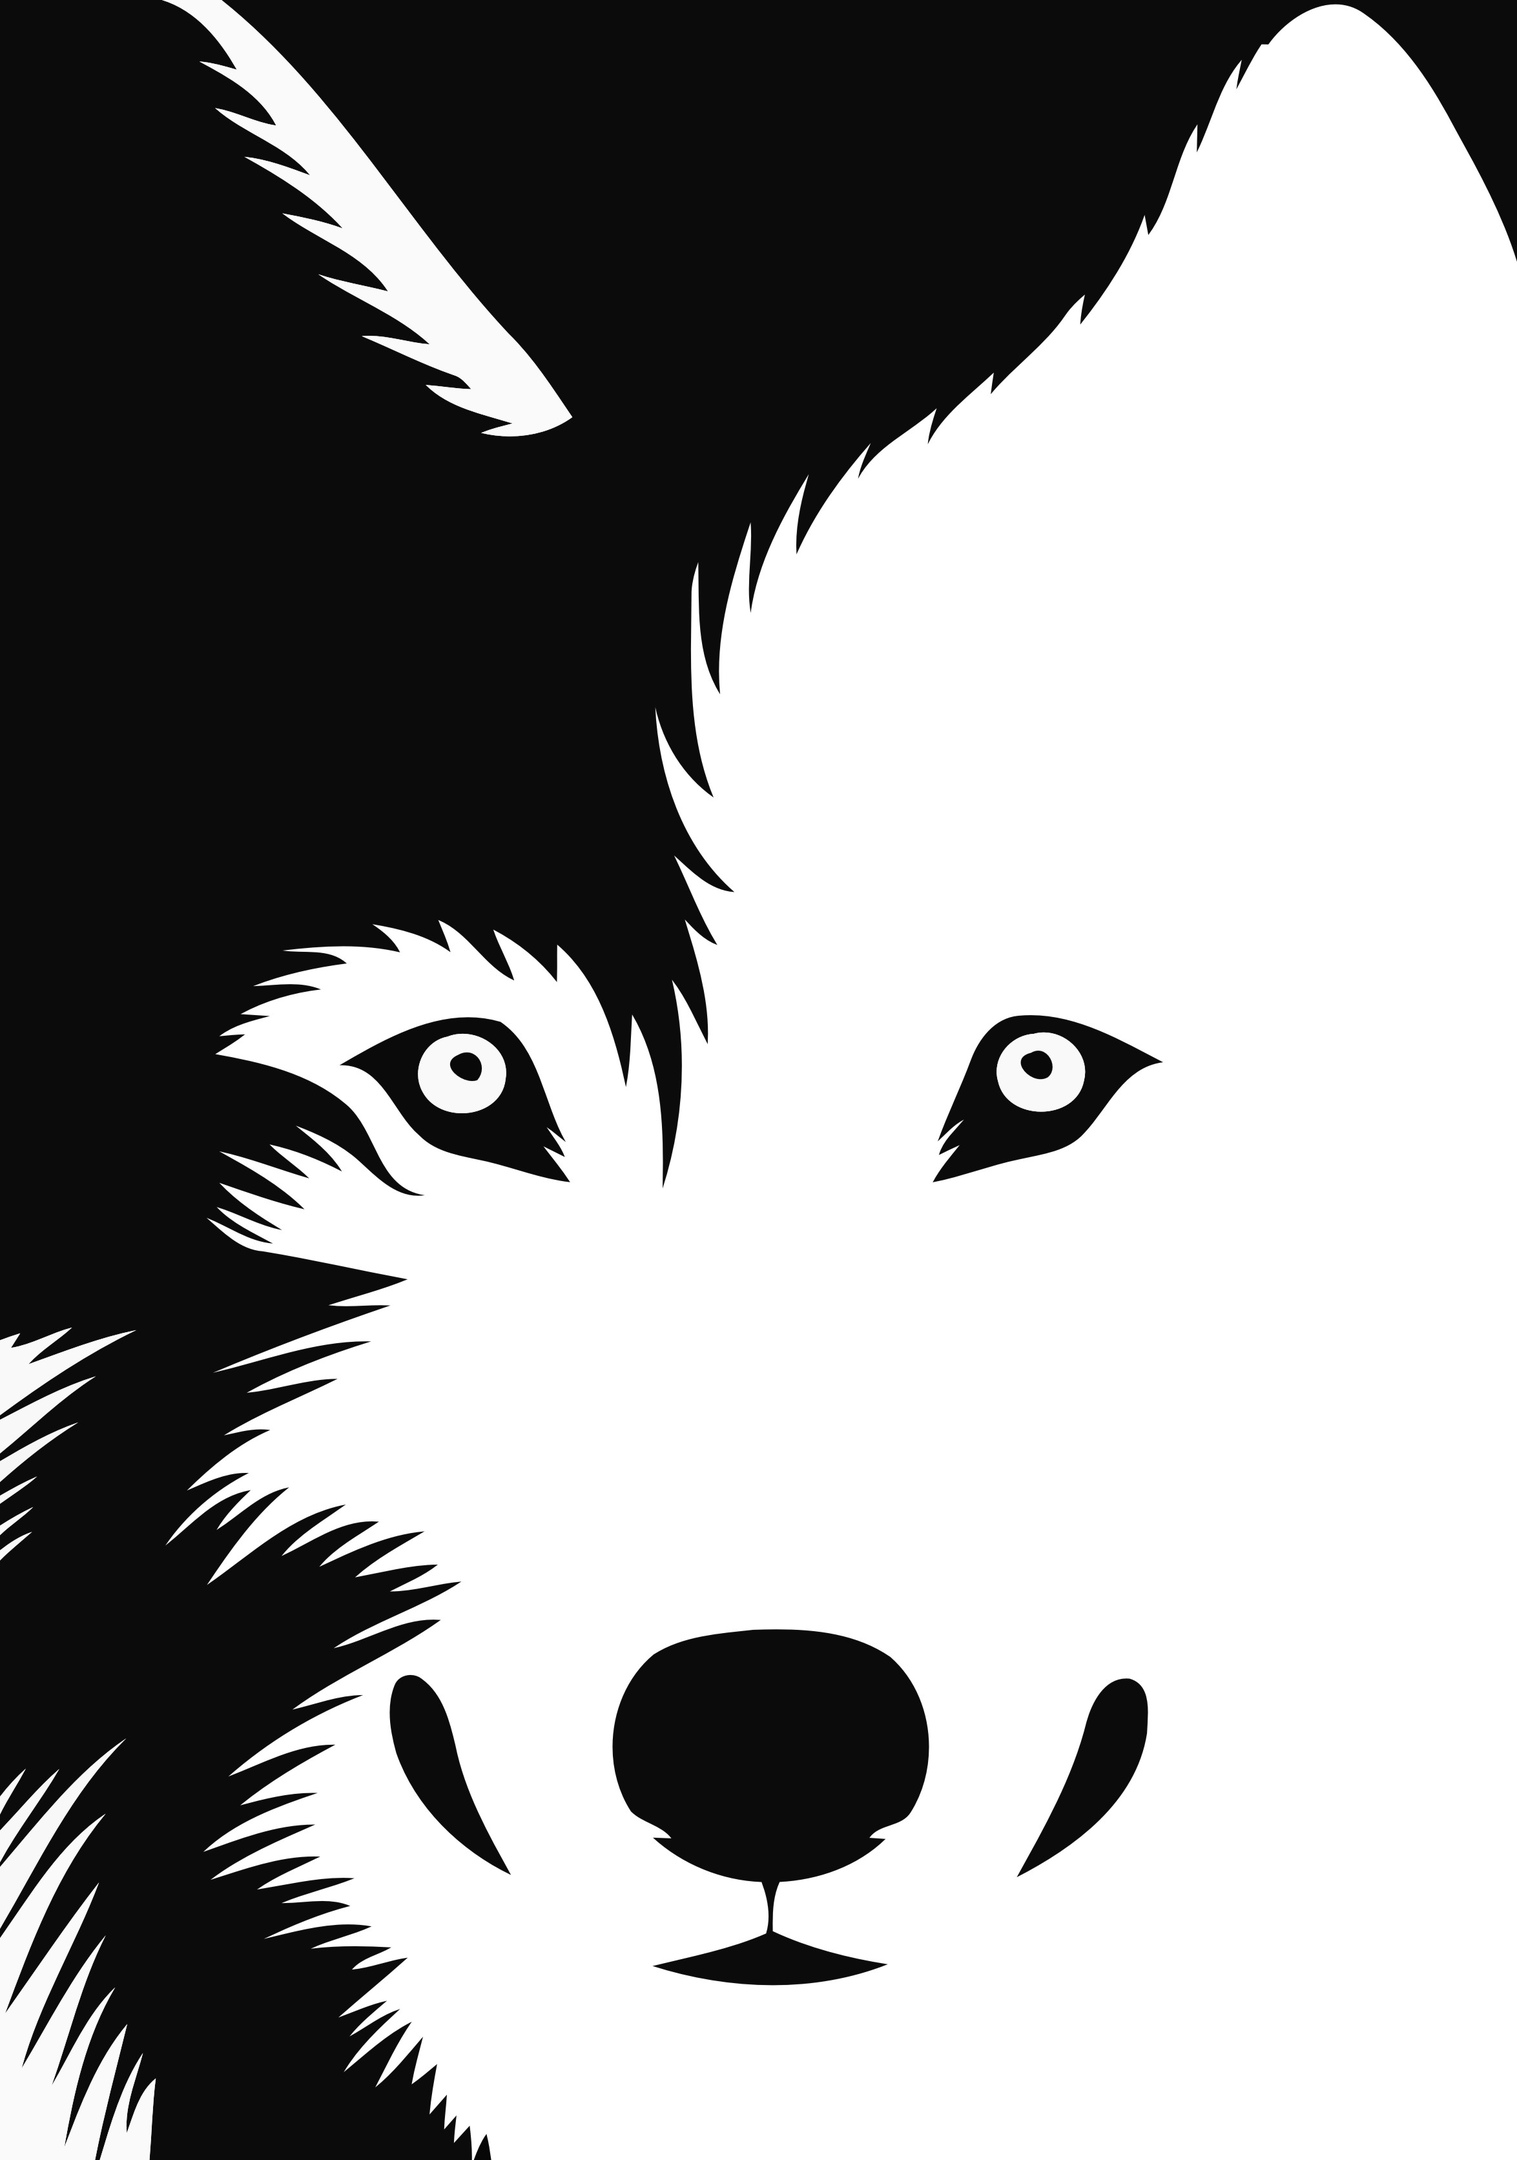 Dog Sticker Stencil Black and White Free Vector